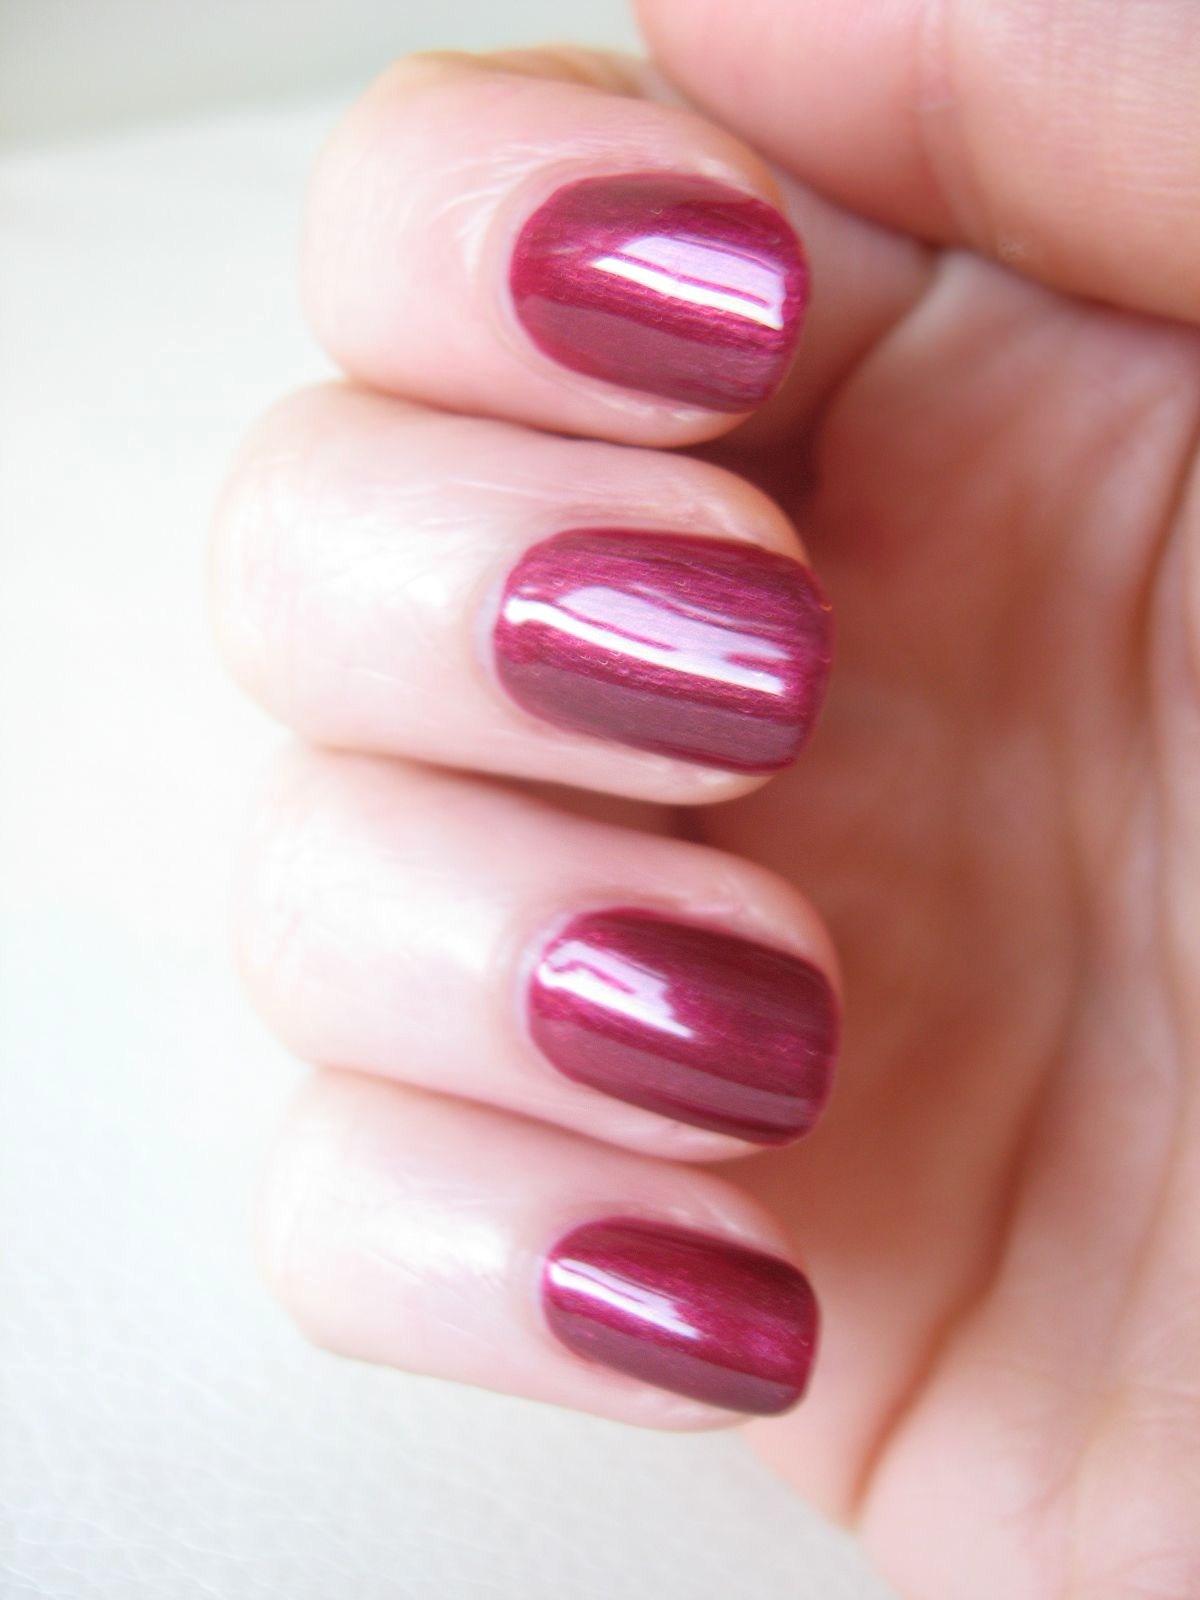 How to perfectly apply Nail Polish | Makeup Savvy - makeup and ...